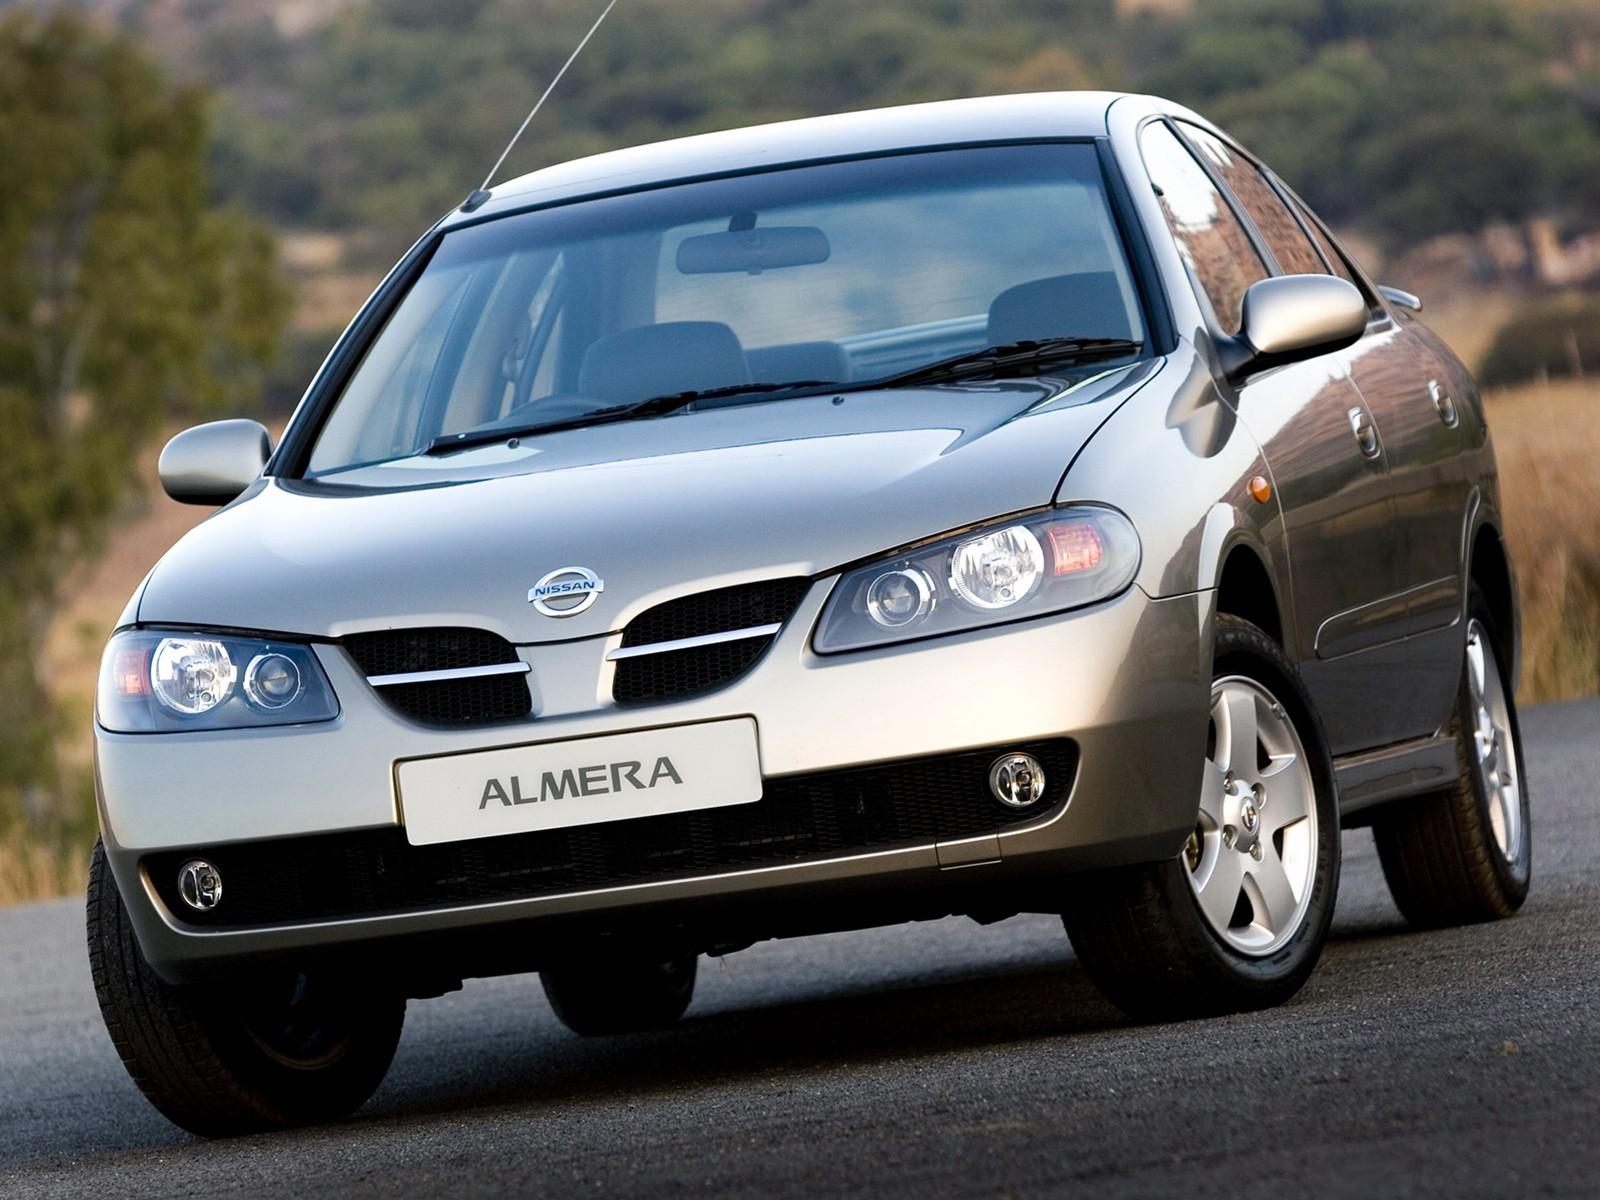 nissan almera pulsar 4 doors 2000 2001 2002 2003 2004 2005 2006 2007 autoevolution. Black Bedroom Furniture Sets. Home Design Ideas